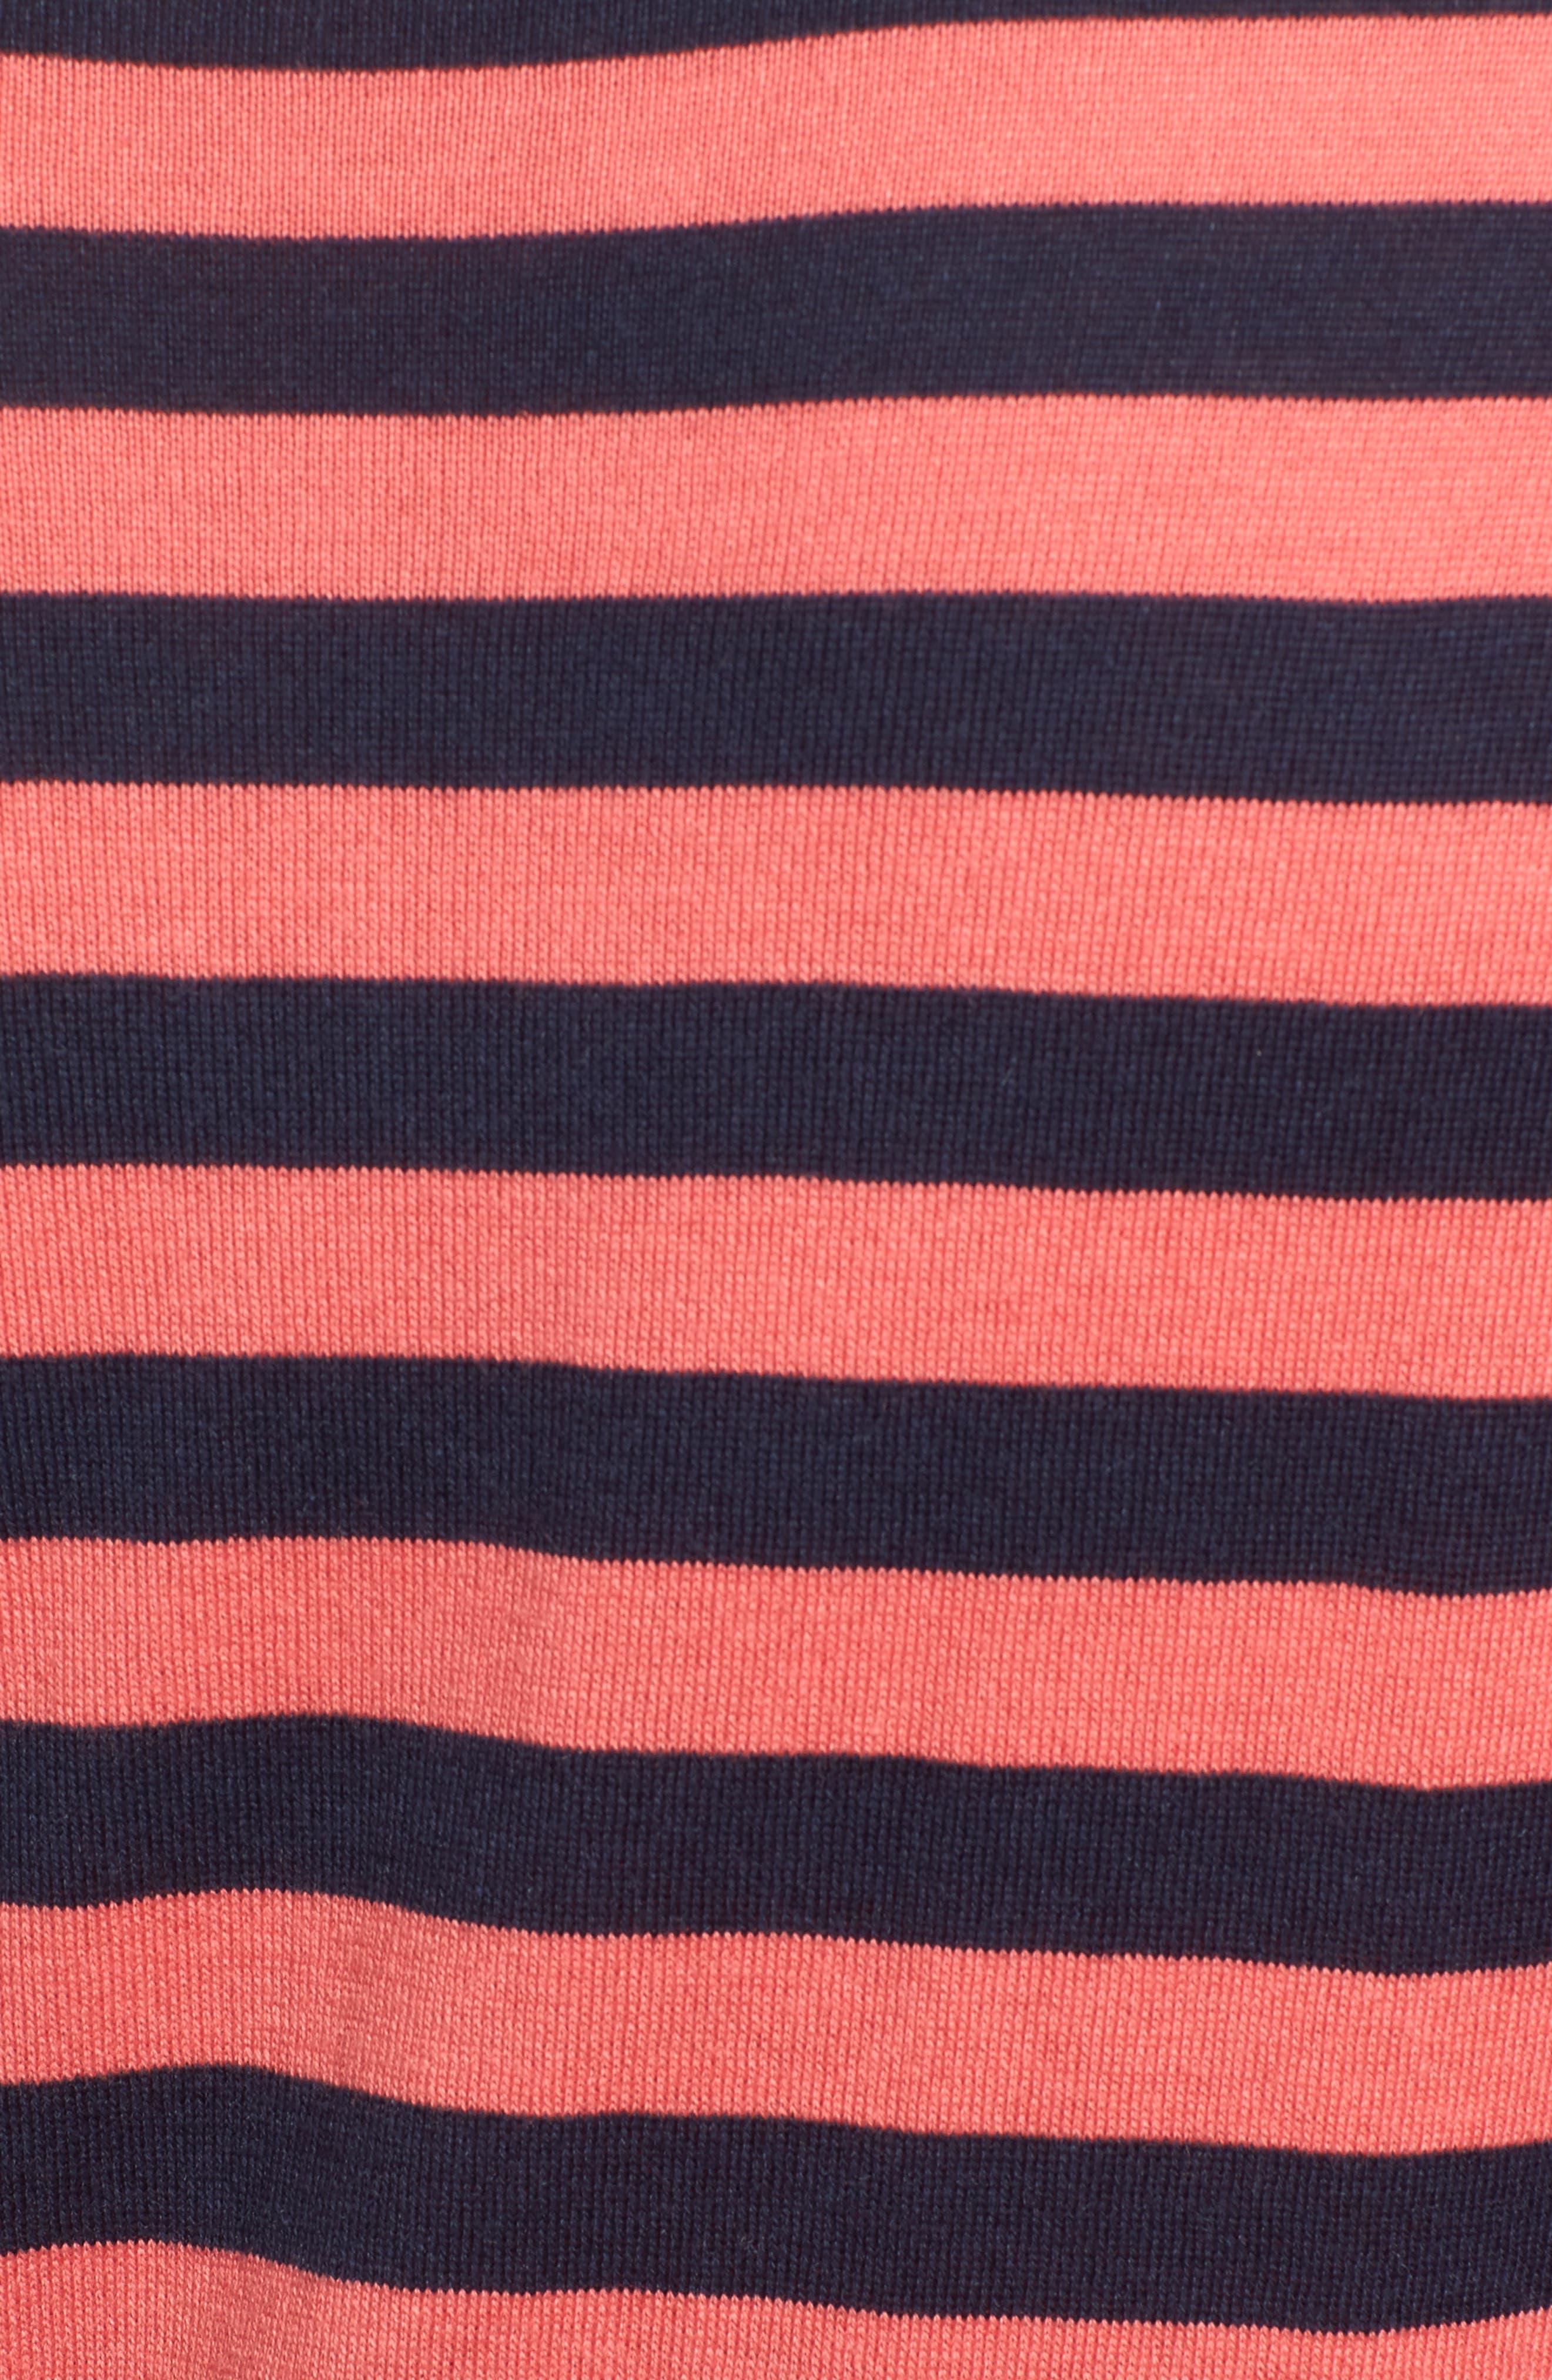 Colorblock Stripe Sweater,                             Alternate thumbnail 20, color,